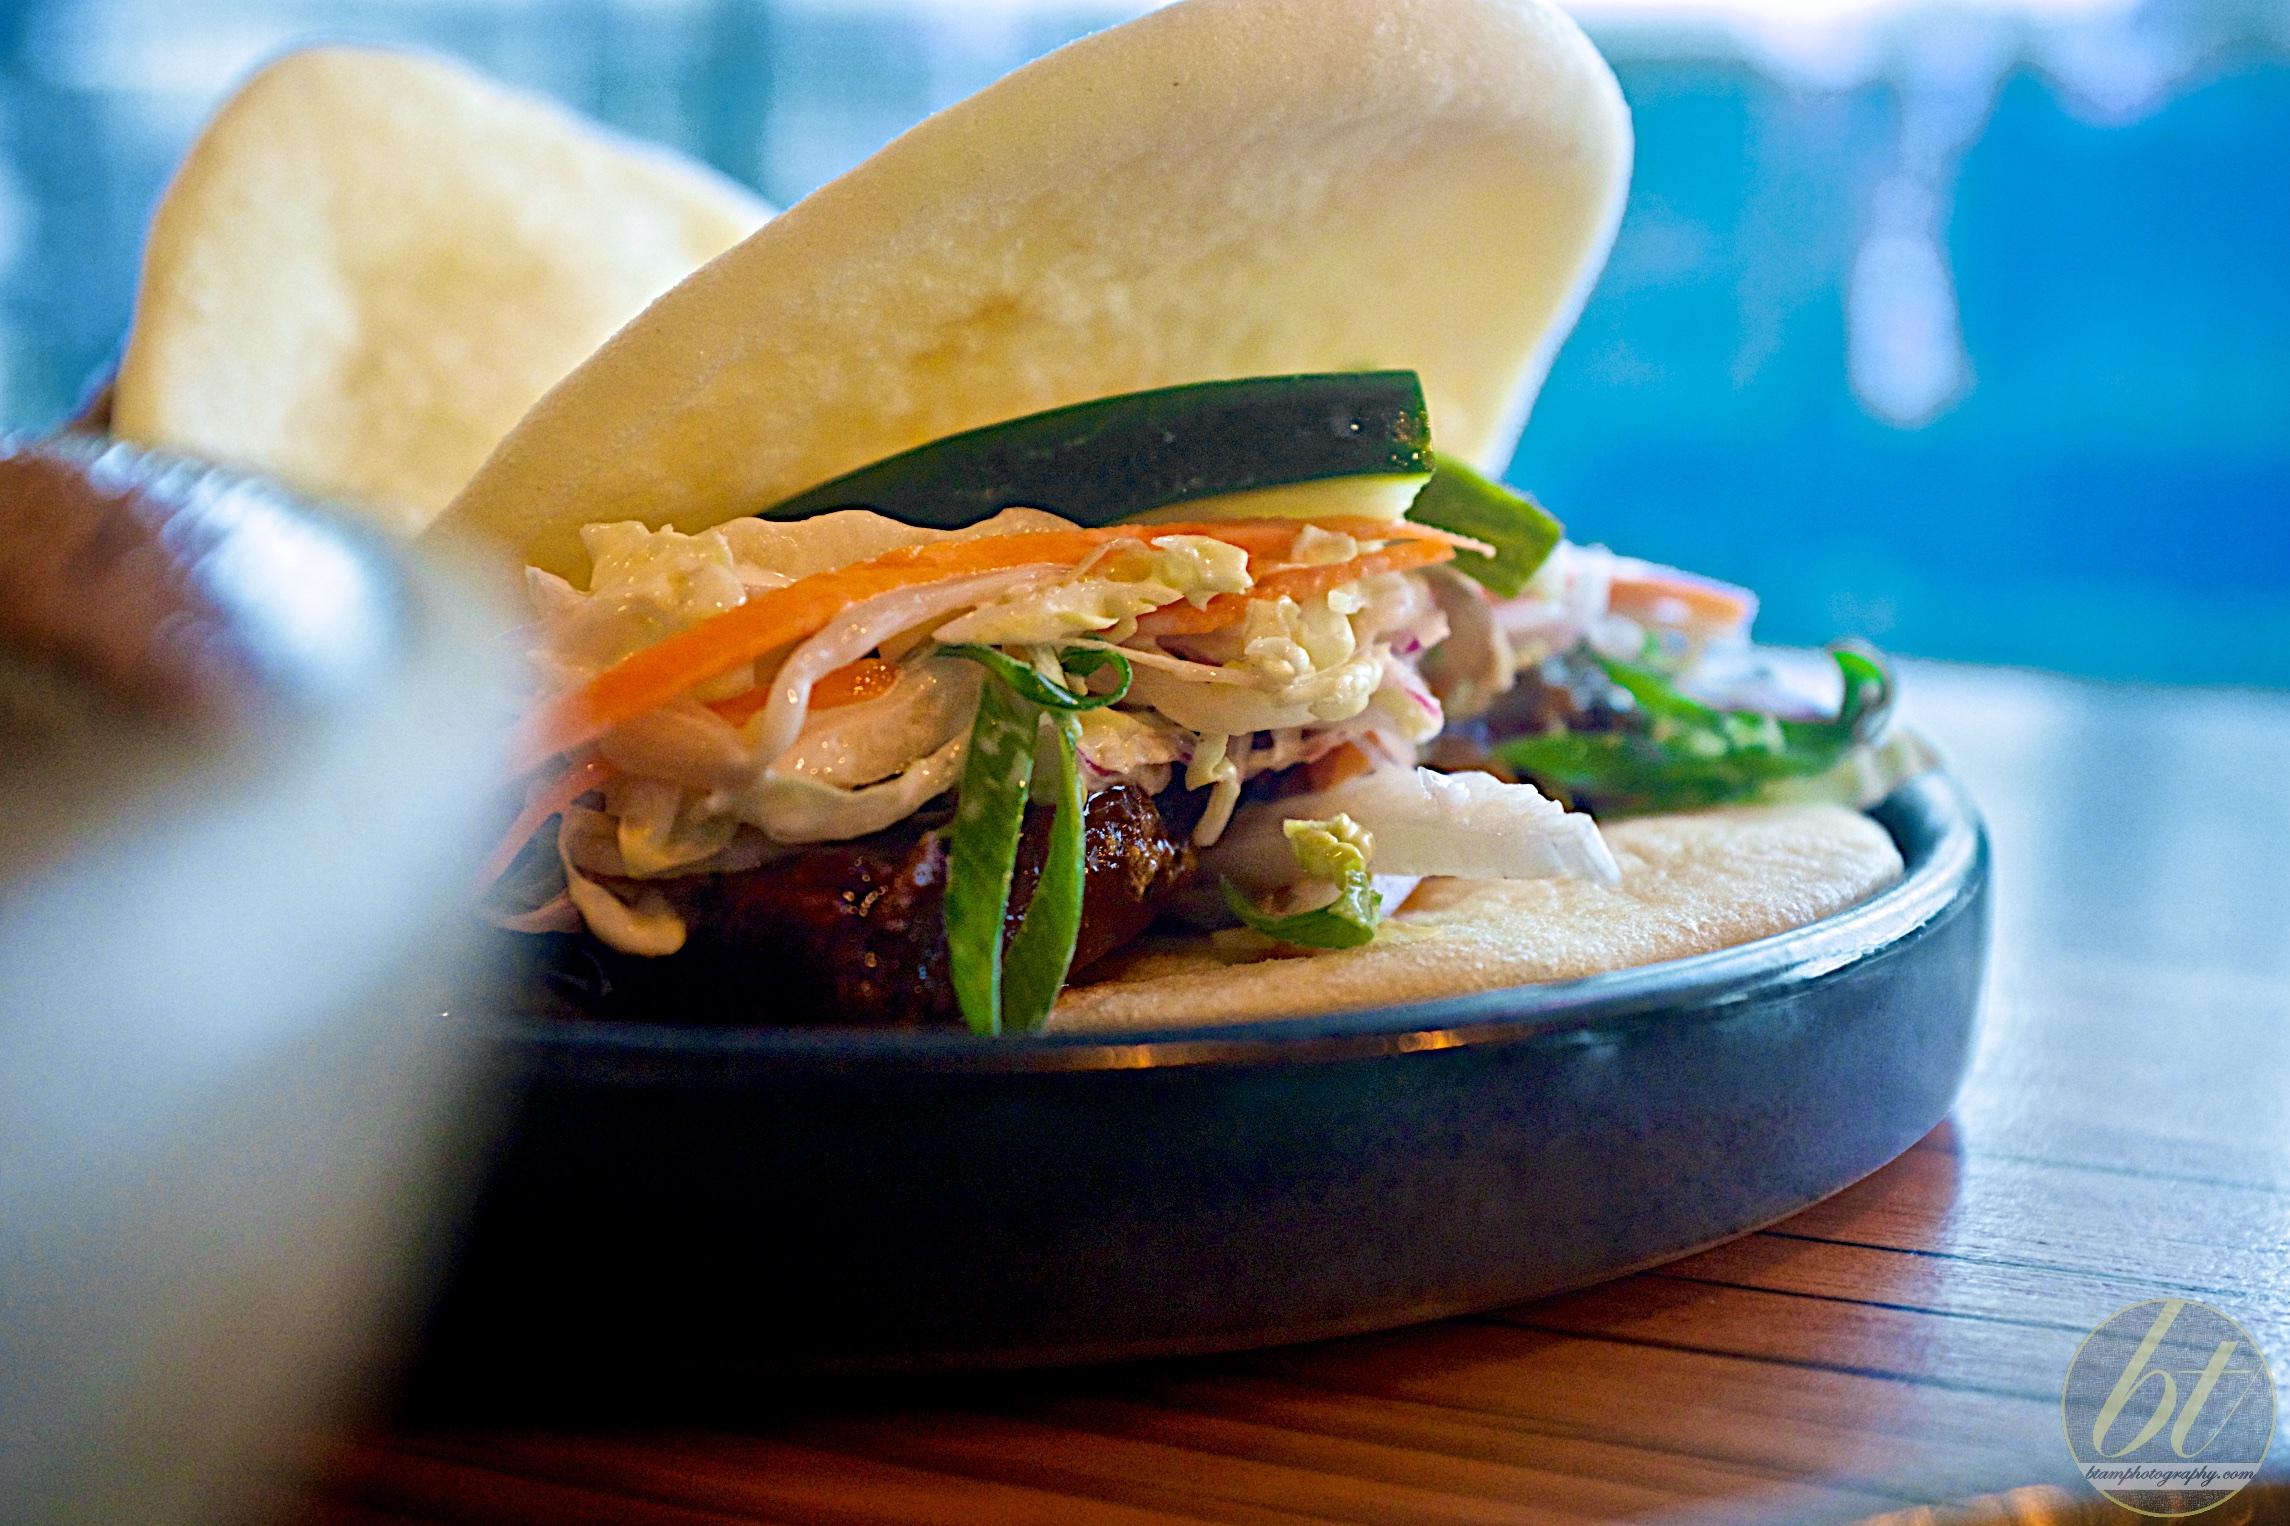 Pork belly bao with asian slaw ($8)